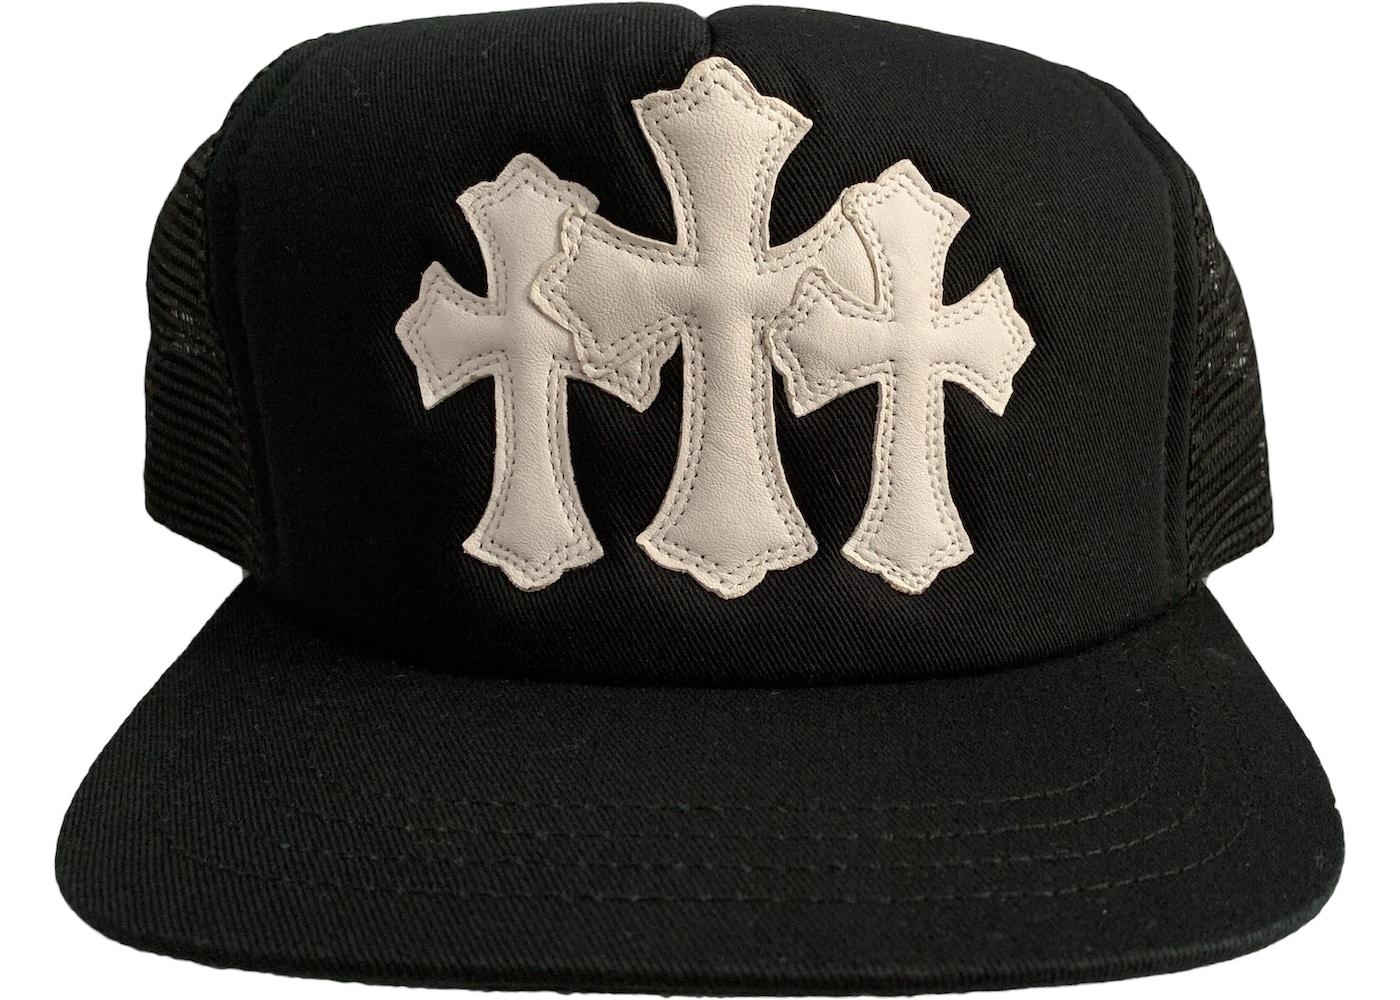 Chrome Hearts Cemetery Trucker Hat Black